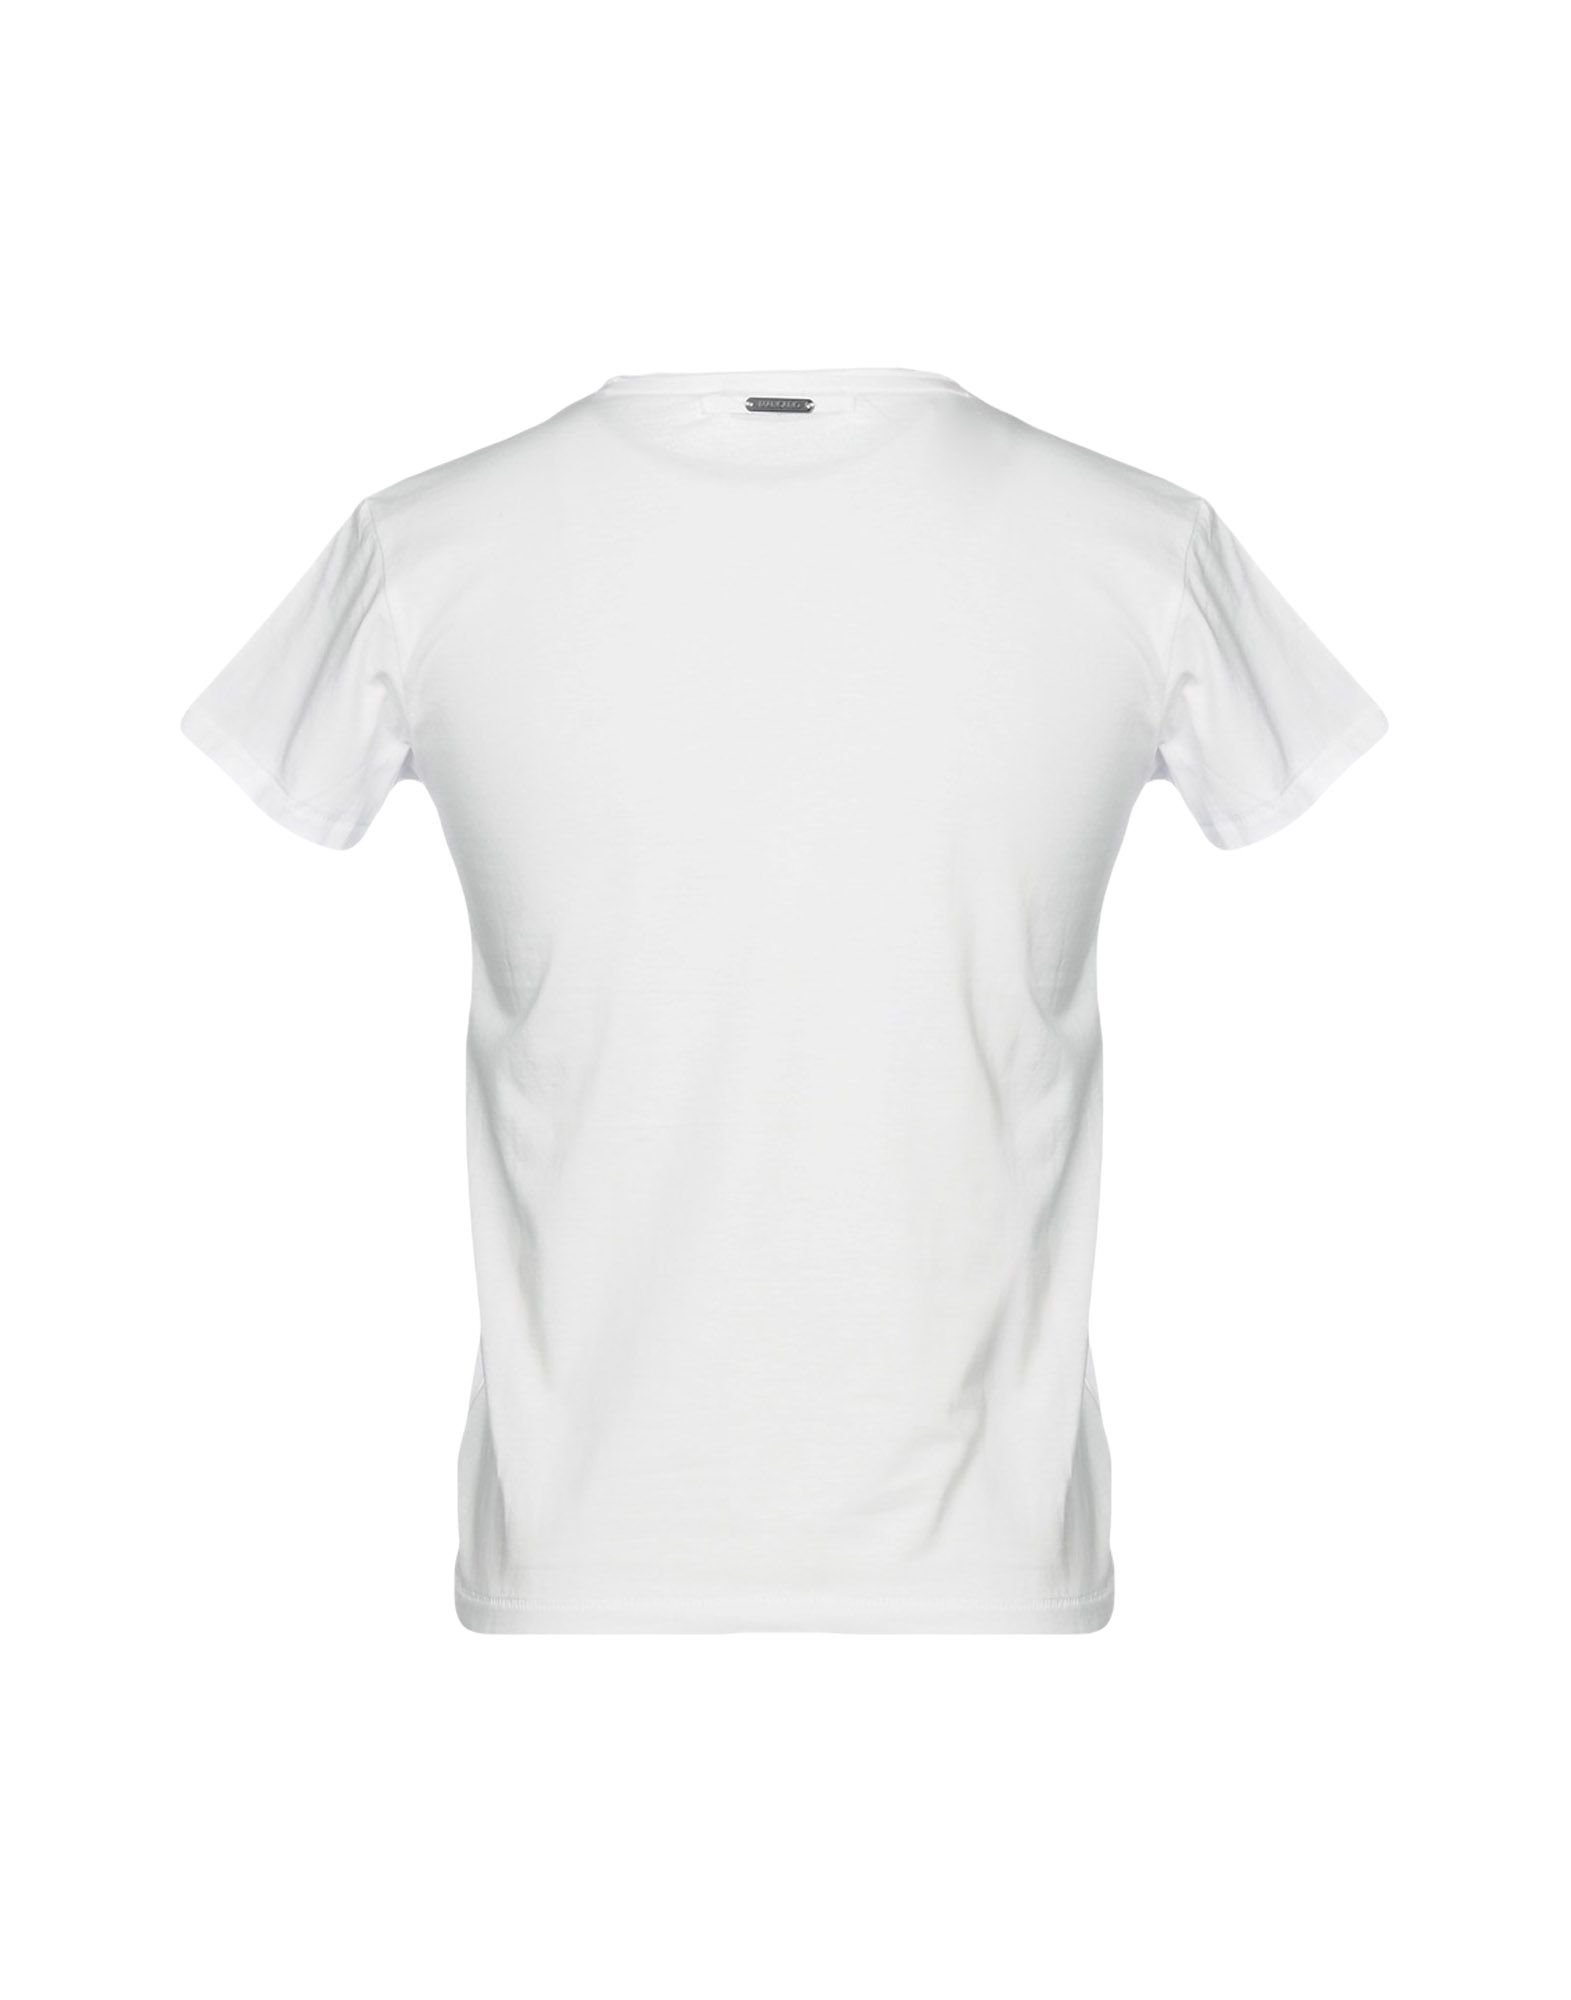 A A buon mercato A A buon mercato T-Shirt Mangano Uomo - 12163004HH 17dd38